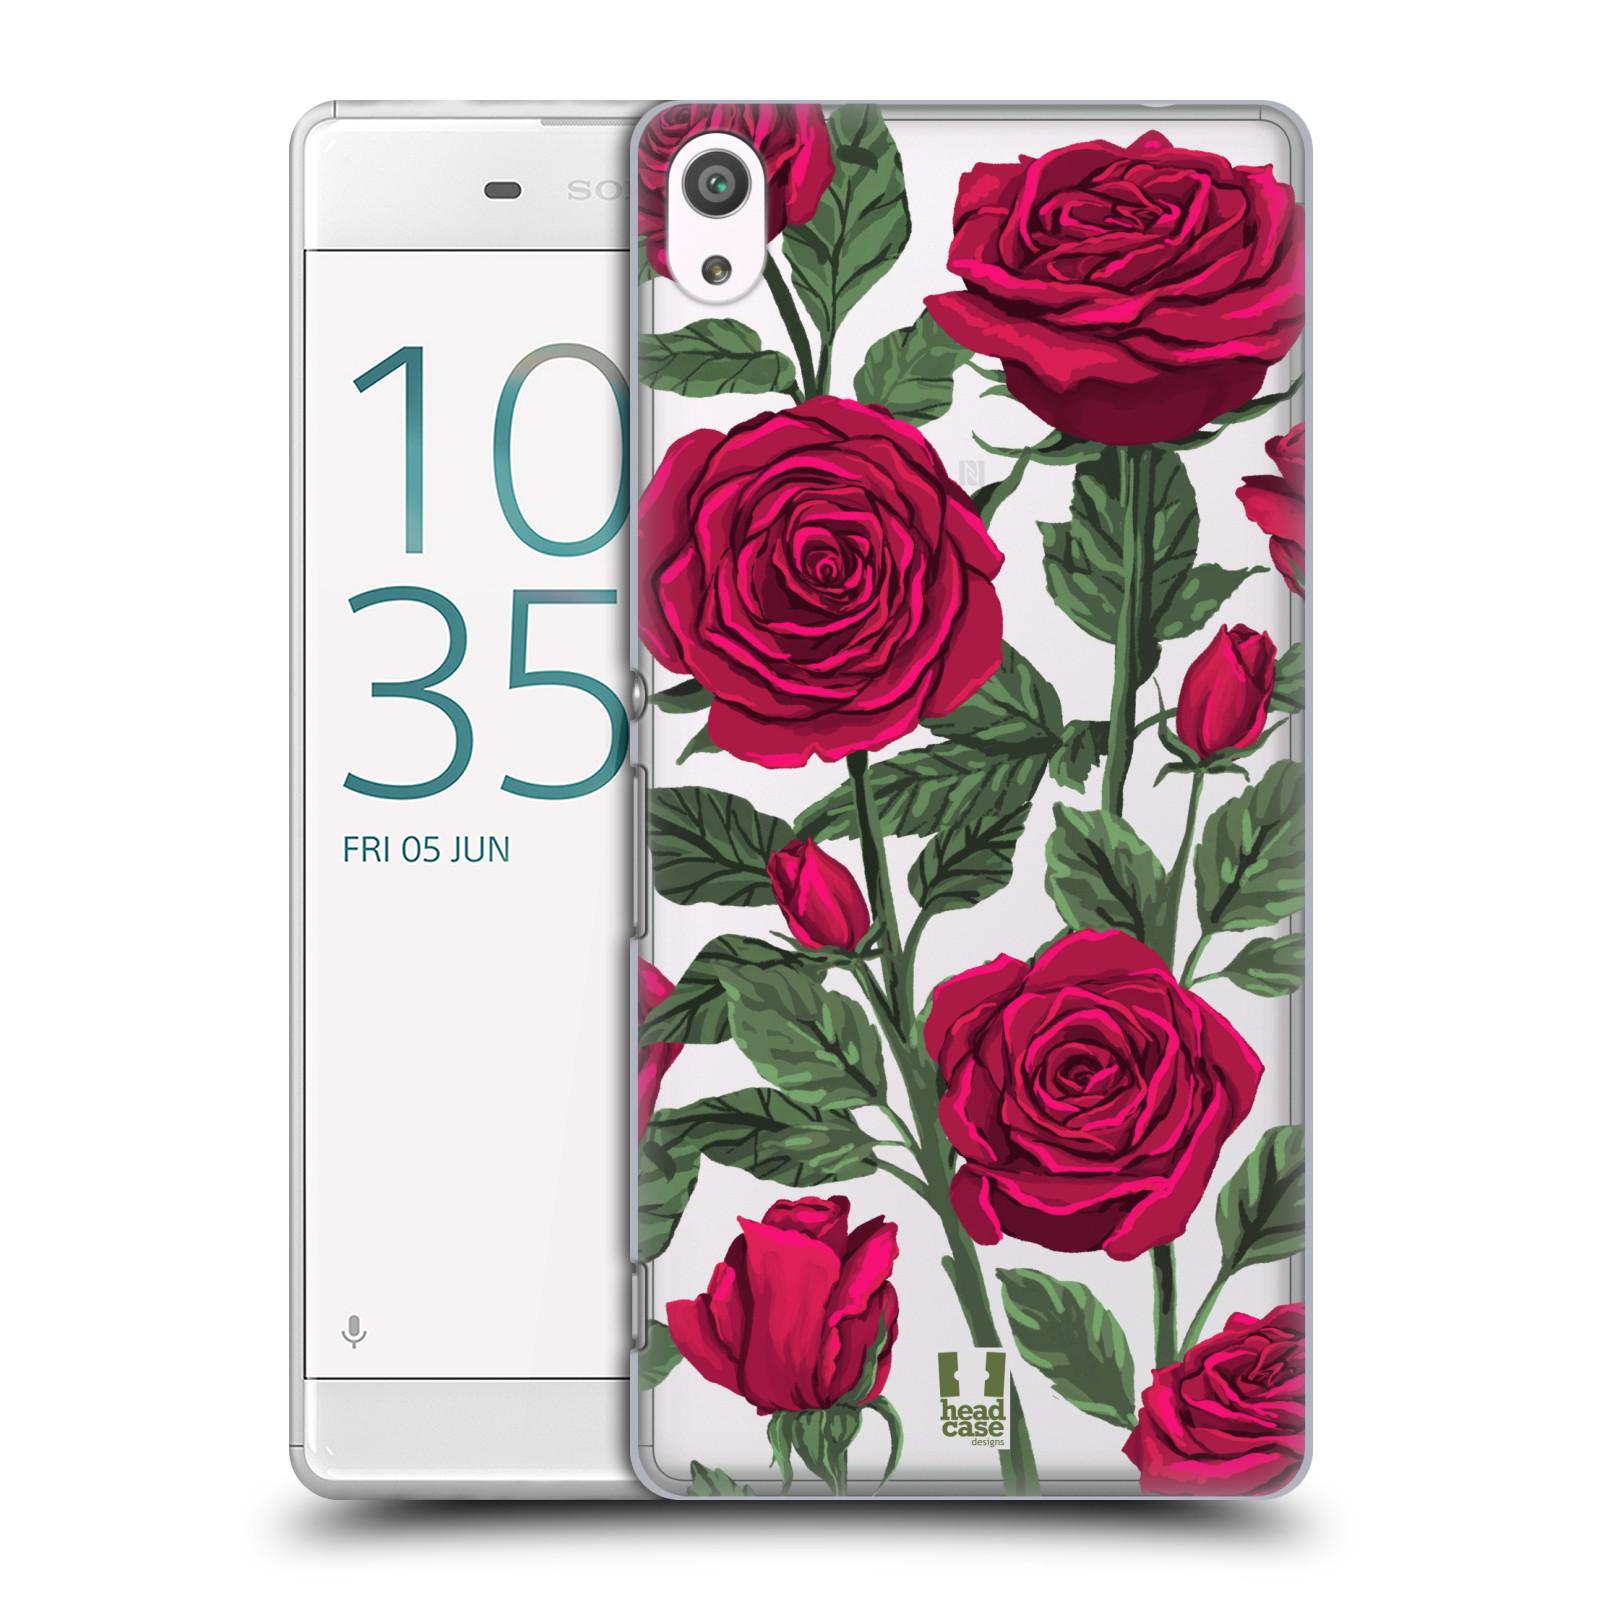 Pouzdro na mobil Sony Xperia XA ULTRA - HEAD CASE - květina růže